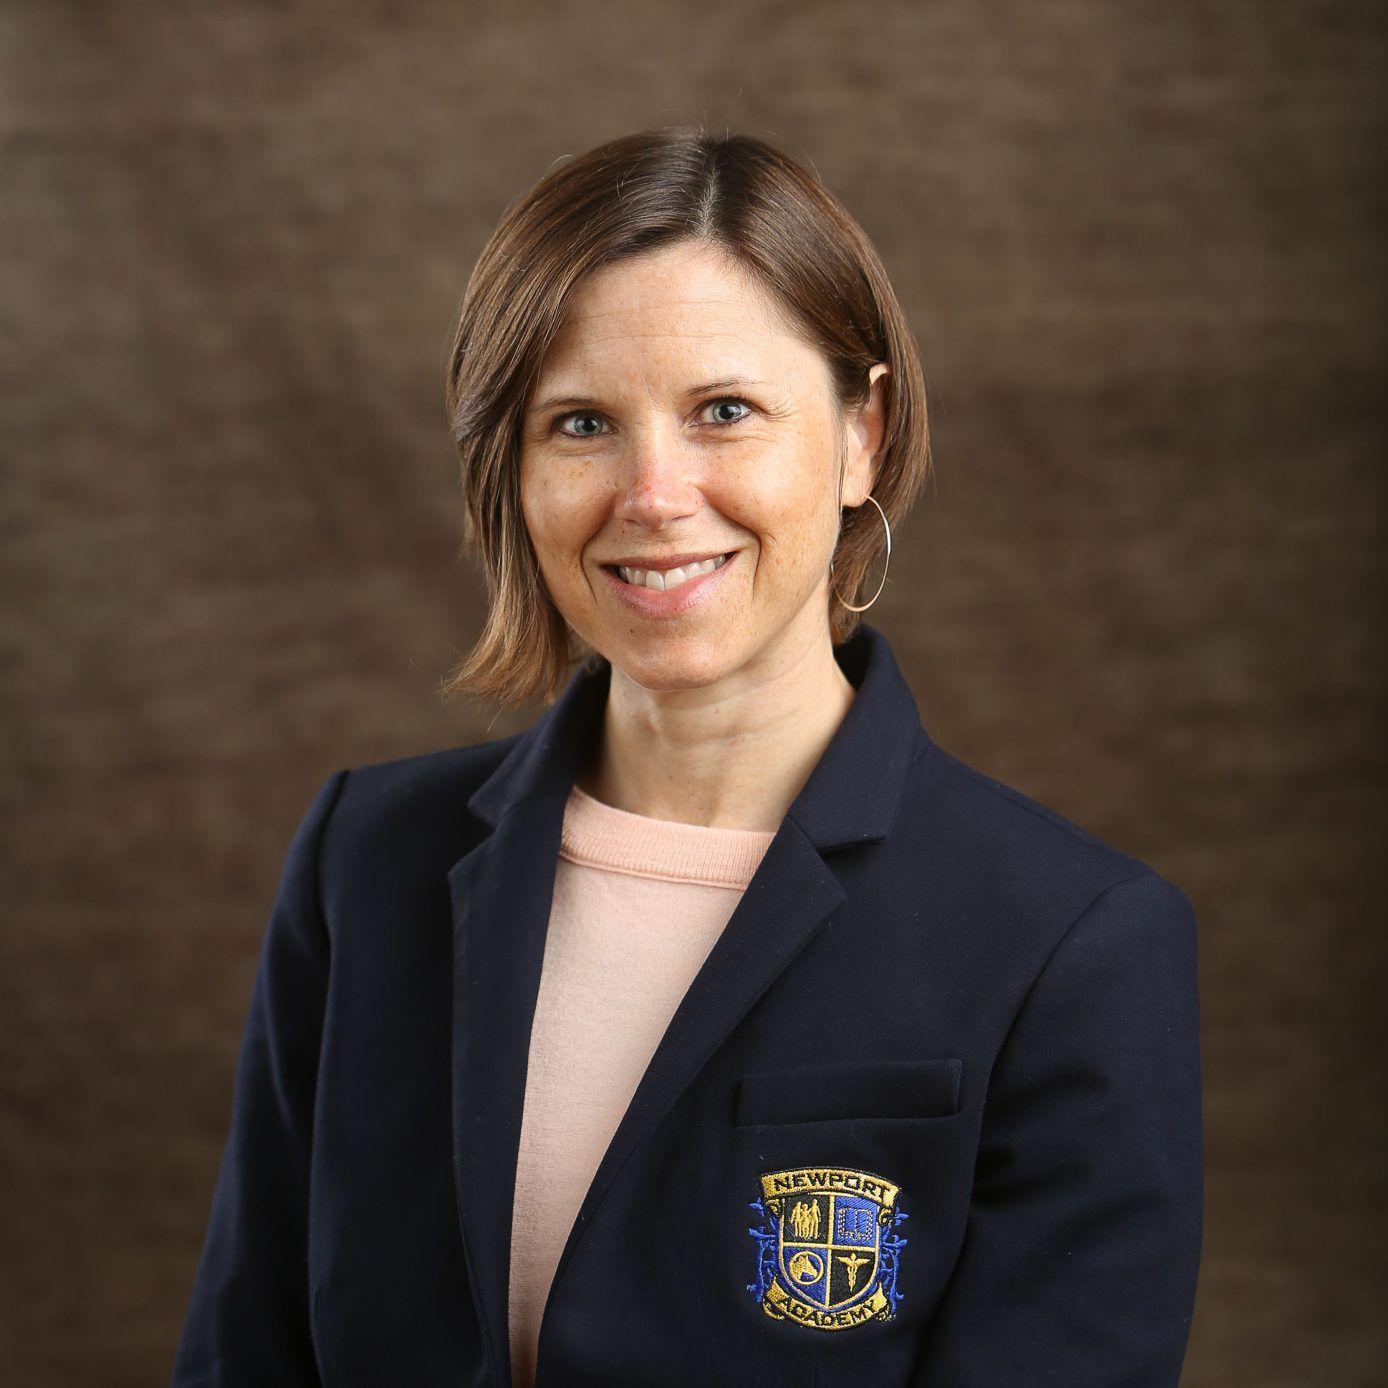 Danielle Roeske